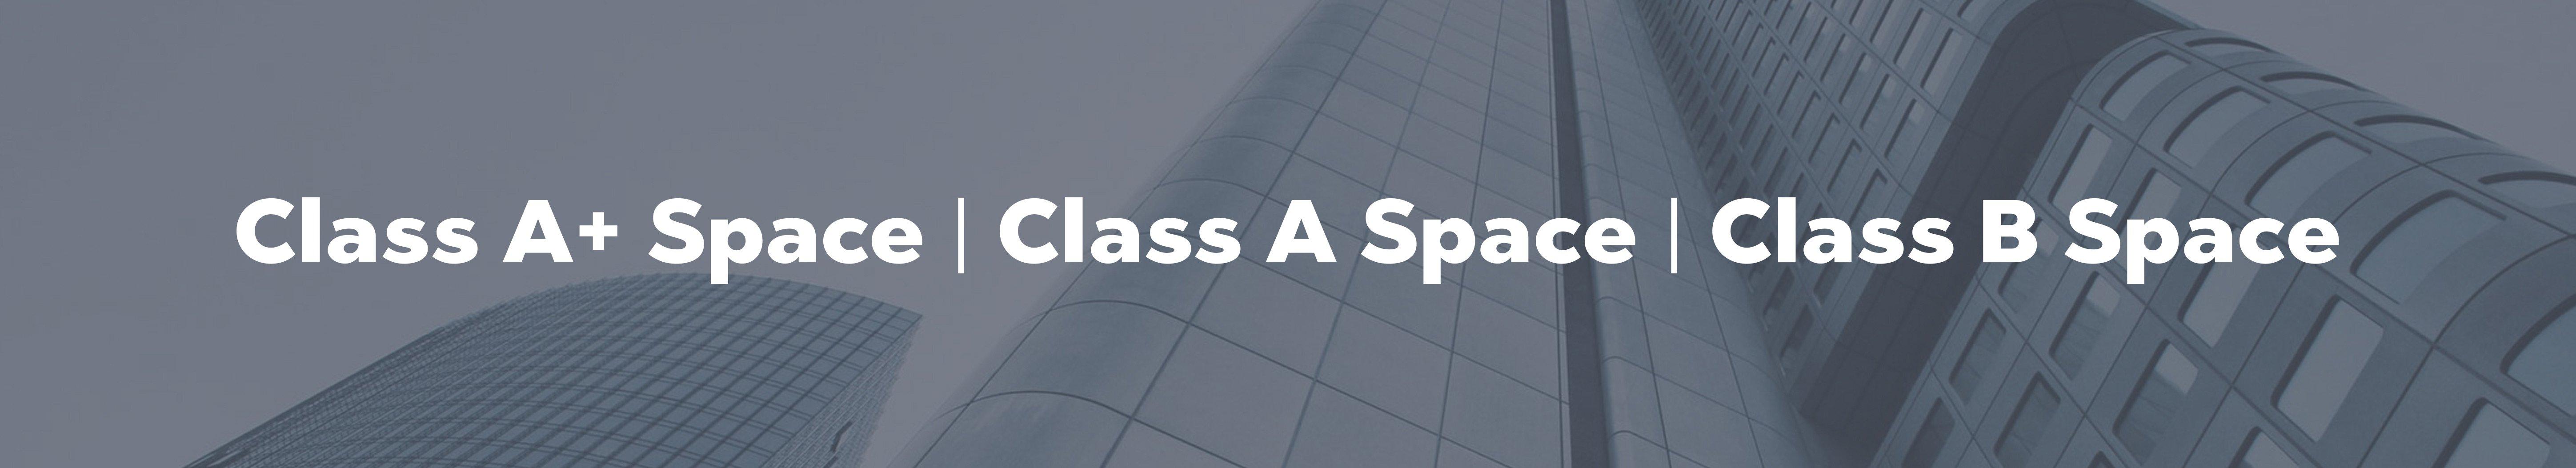 Tenantbase-blog_Plano_InternalGraphic